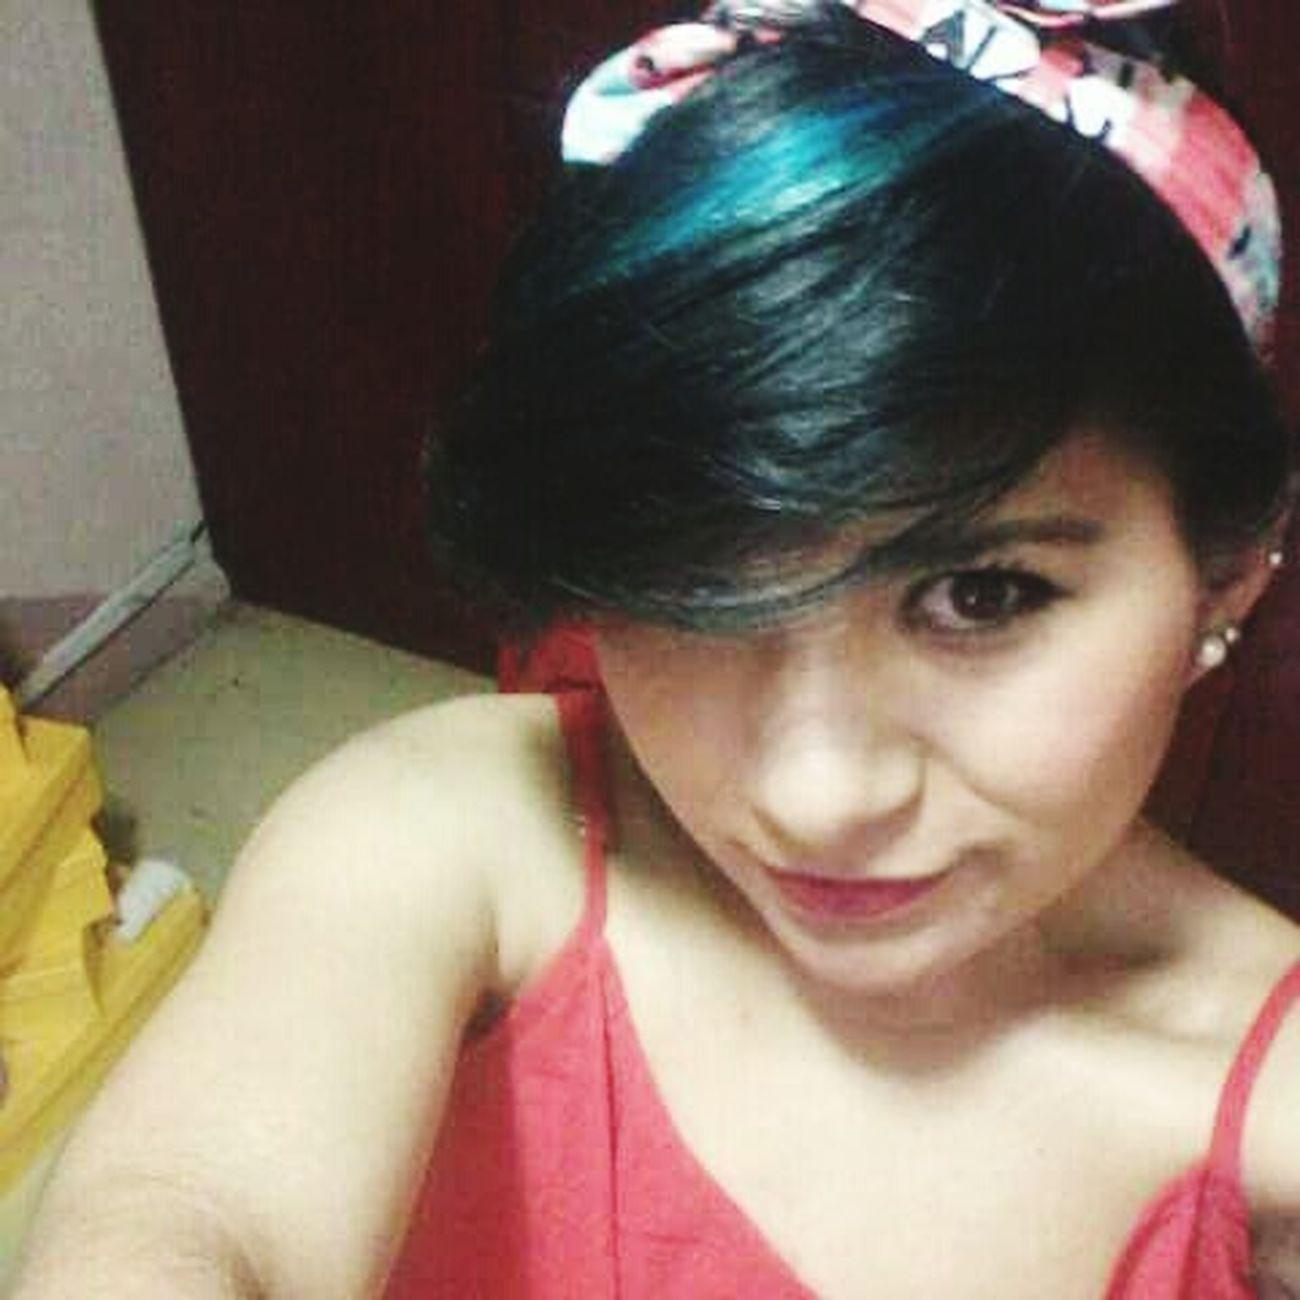 Me Pretty Girl Red Lips Kiss Me Blue Hair I'm HOT